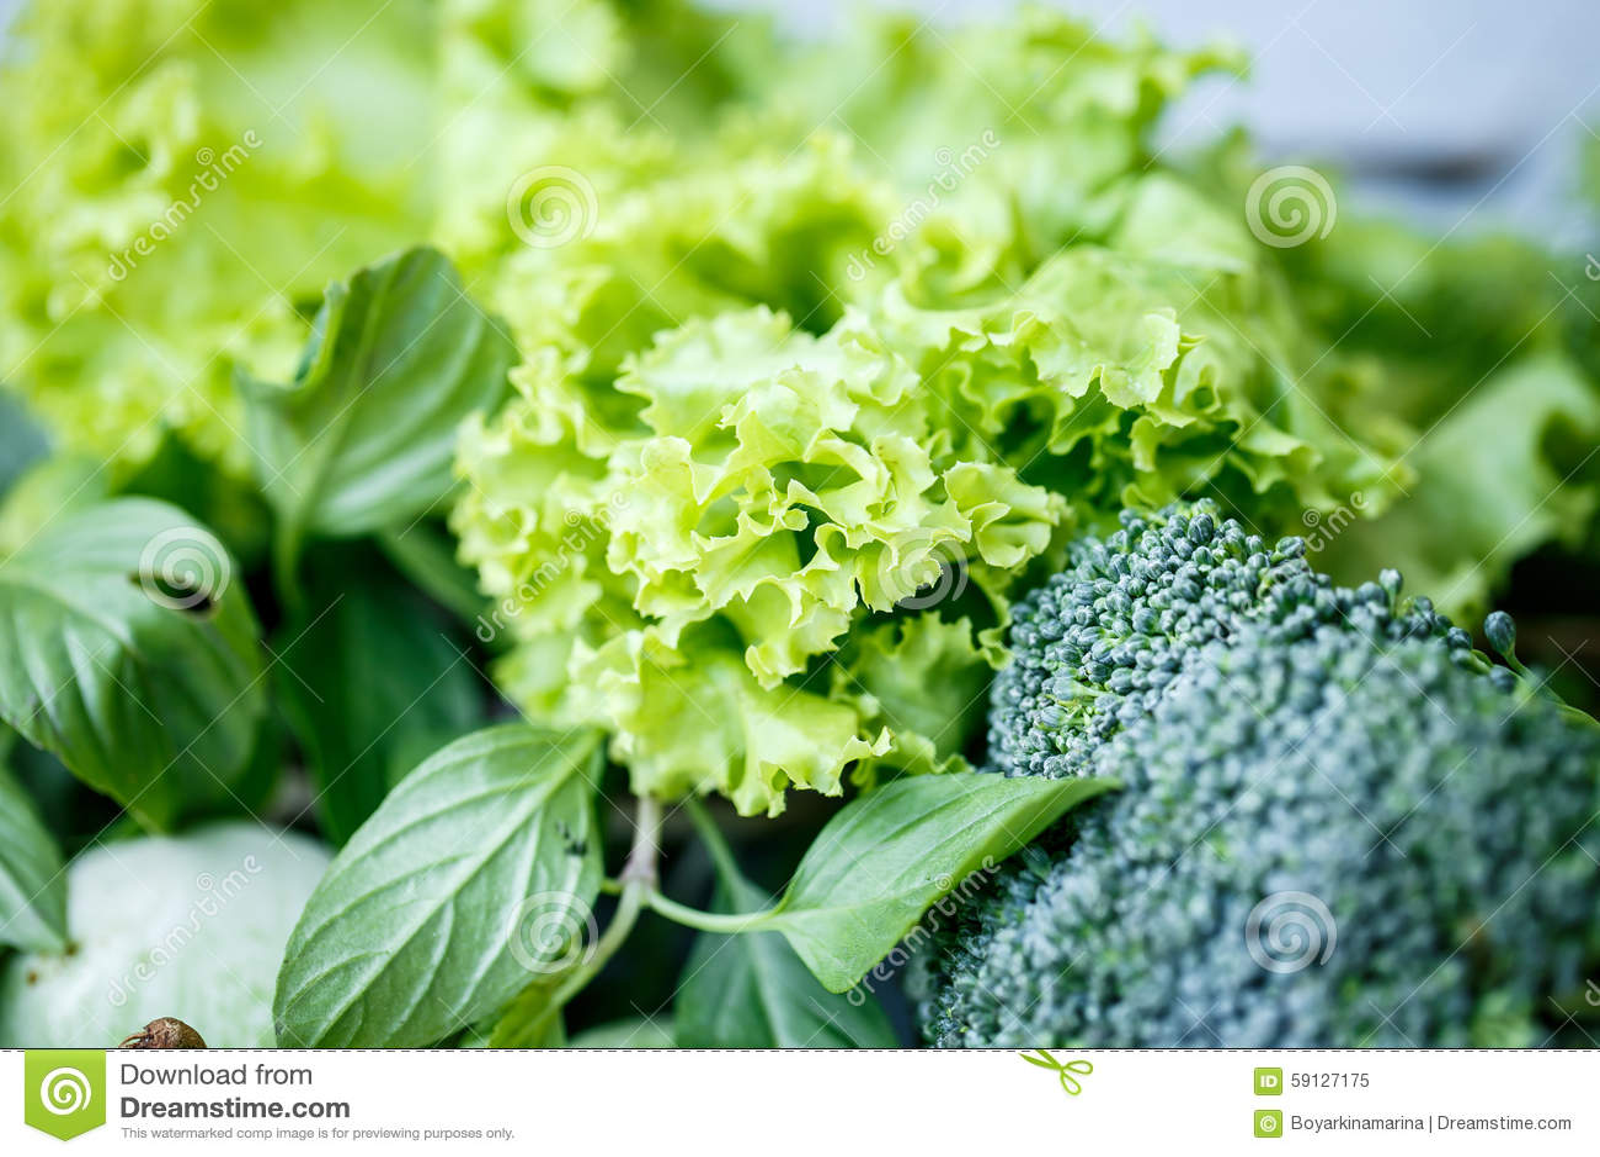 Kopfsalat Brokkoli Und Grüner Salat Stockbild Bild Von Gurke